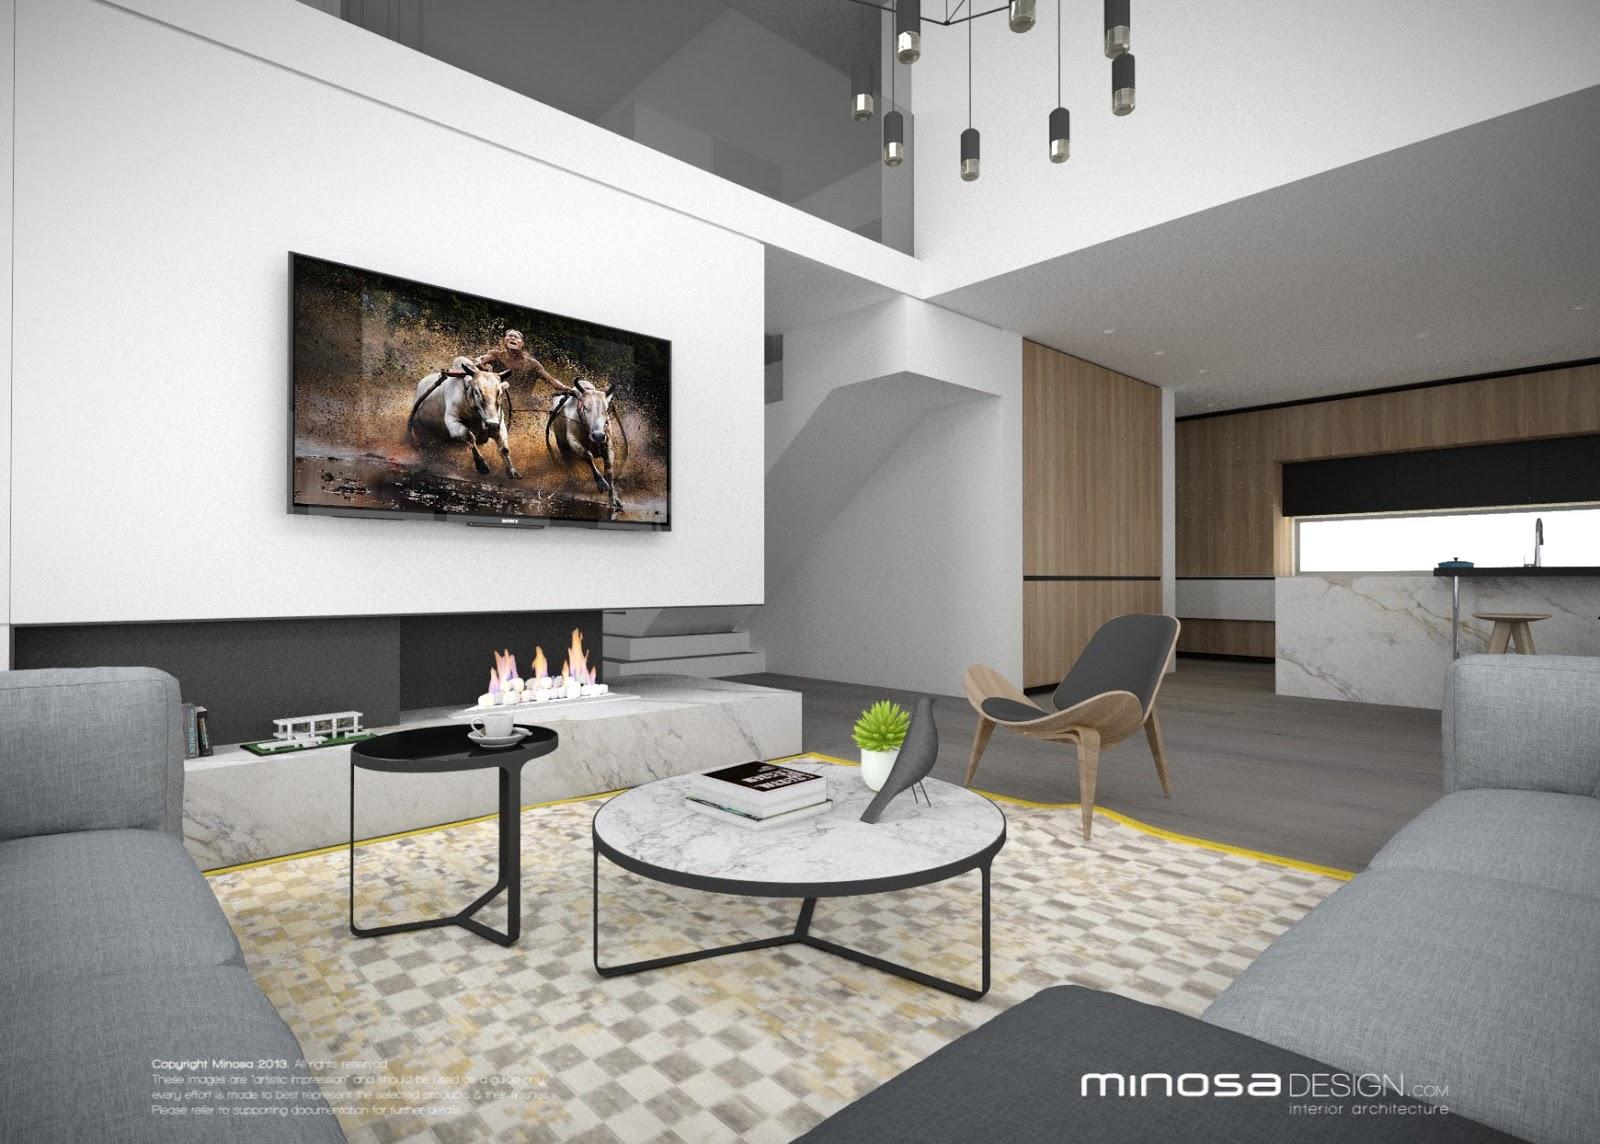 Minosa: The Modern Living Room - Kitchen, Lounge & Dine